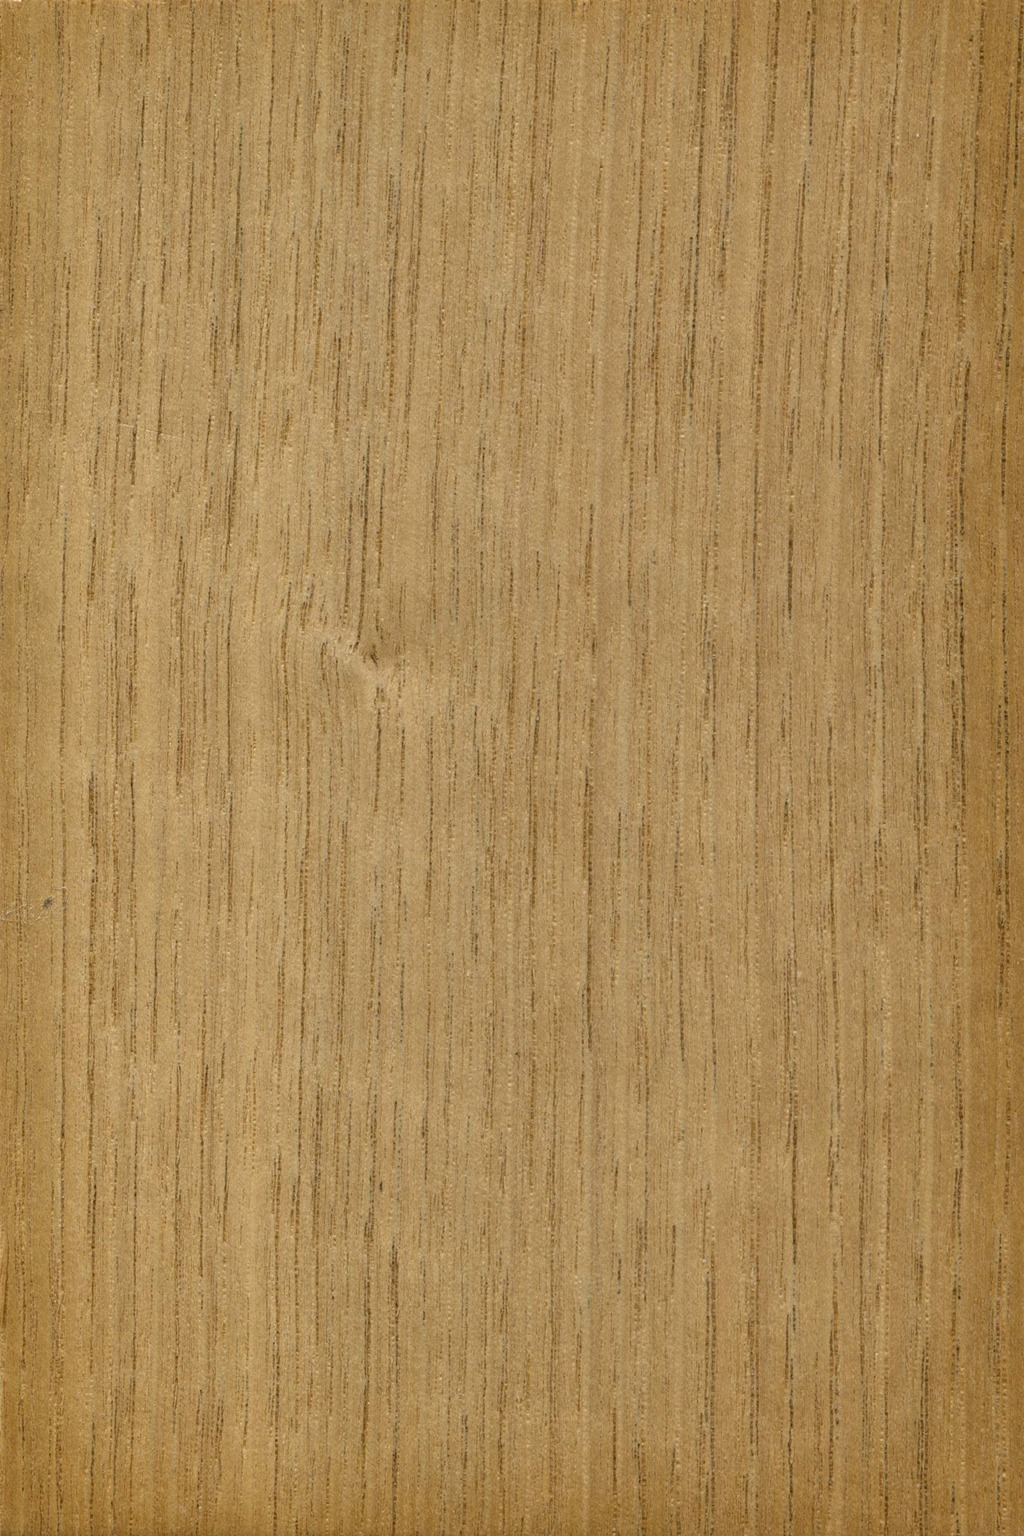 3d贴图 木材质